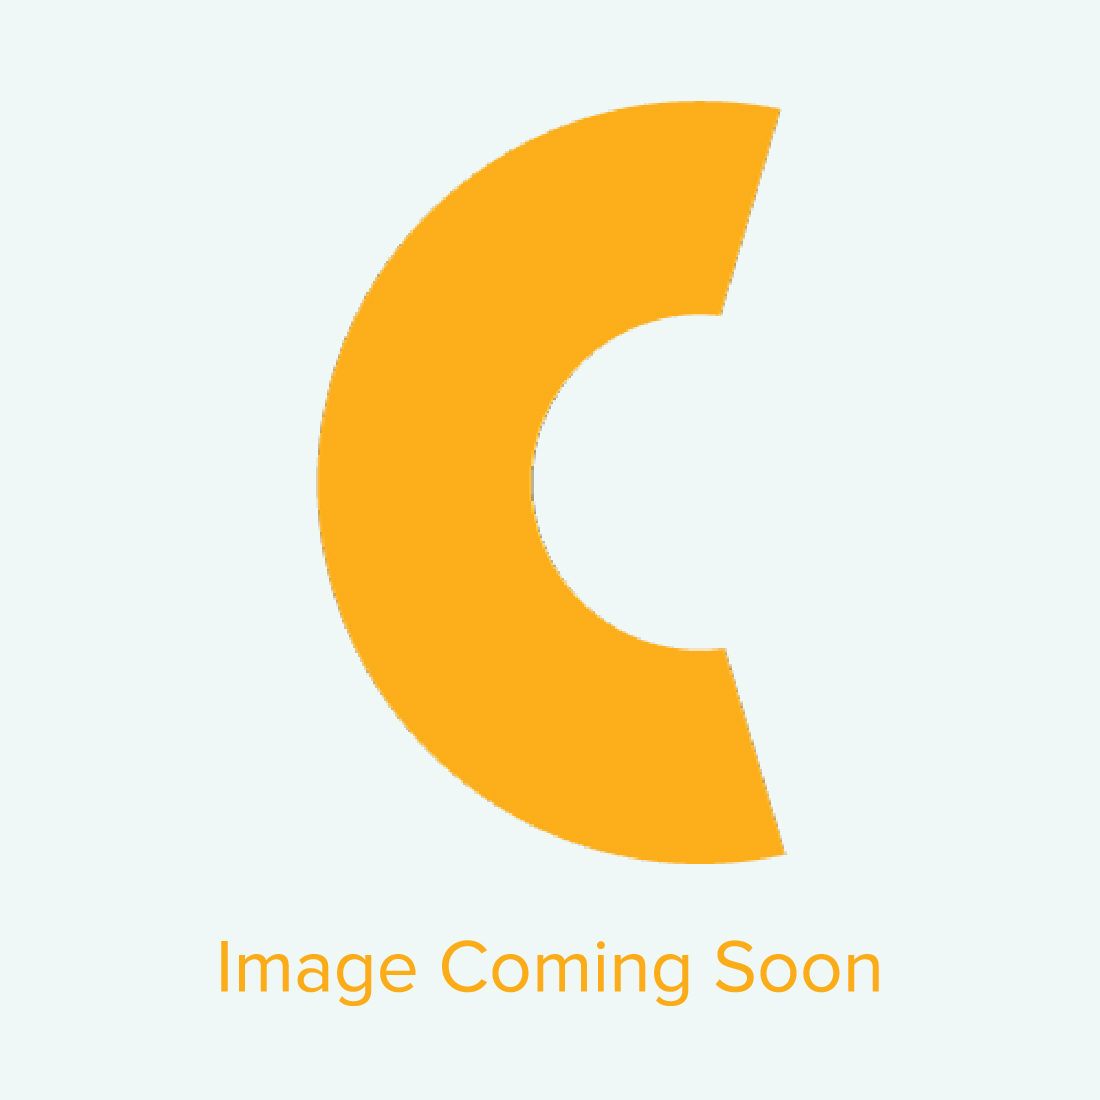 "Graphtec CE LITE-50 20"" Cutting Plotter"